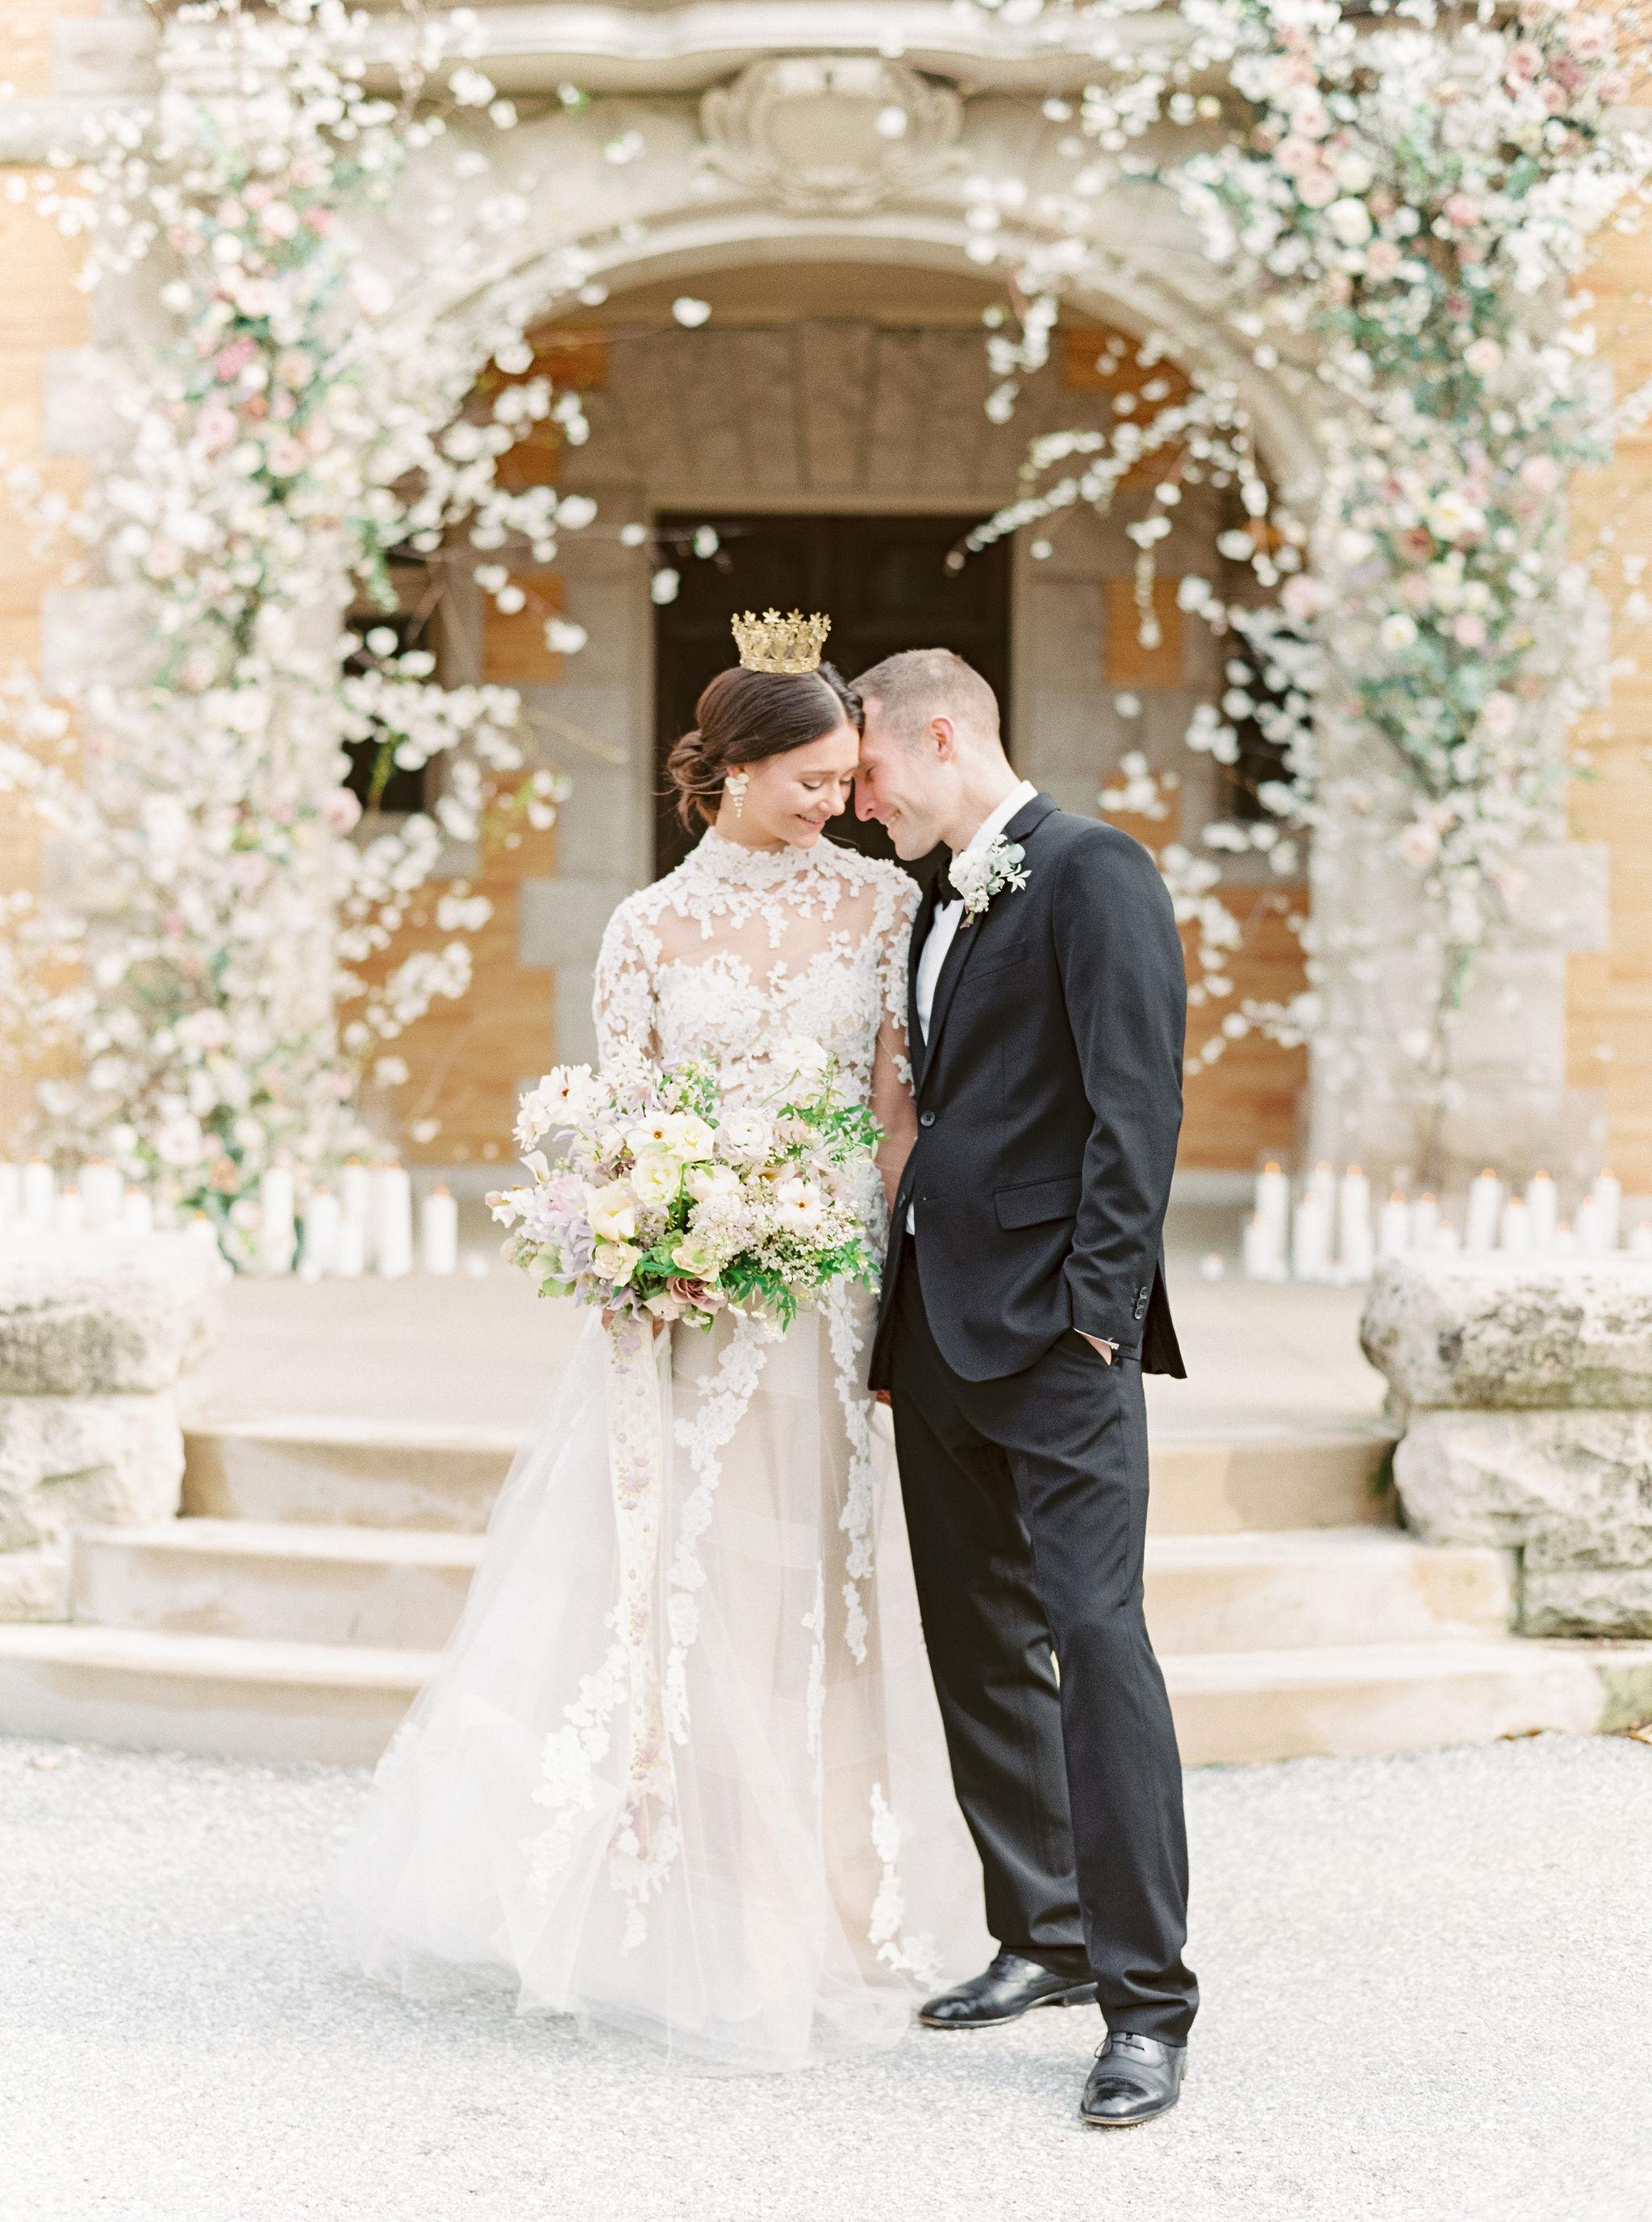 Lauren Fair and East Made Co Wedding Film Photography Workshop at Cairnwood Estate_105.jpg